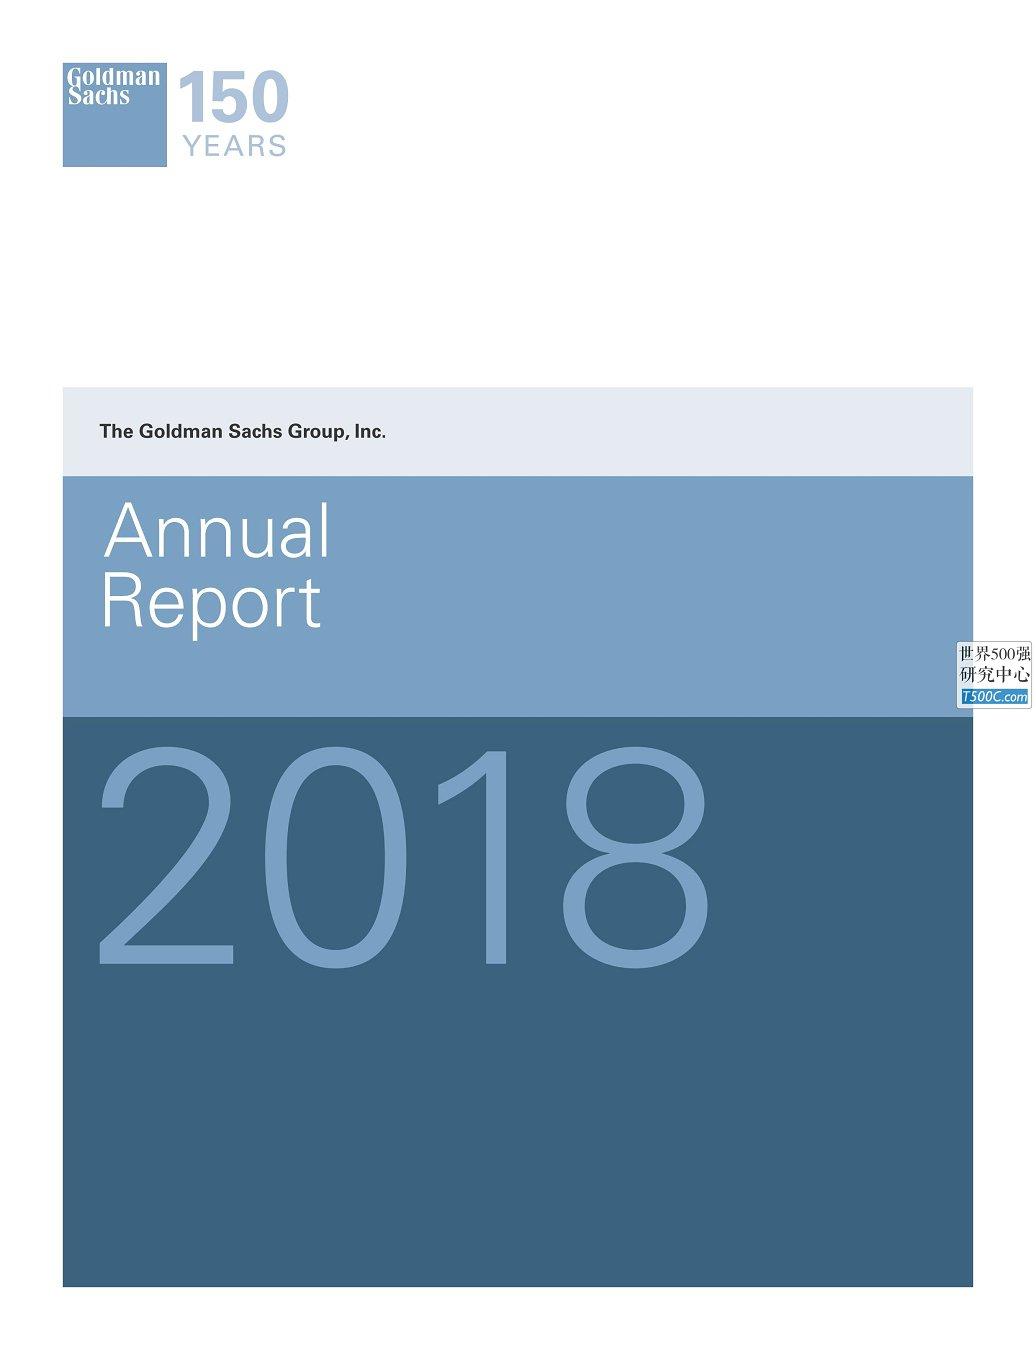 高盛GoldmanSachs_年报AnnualReport_2018